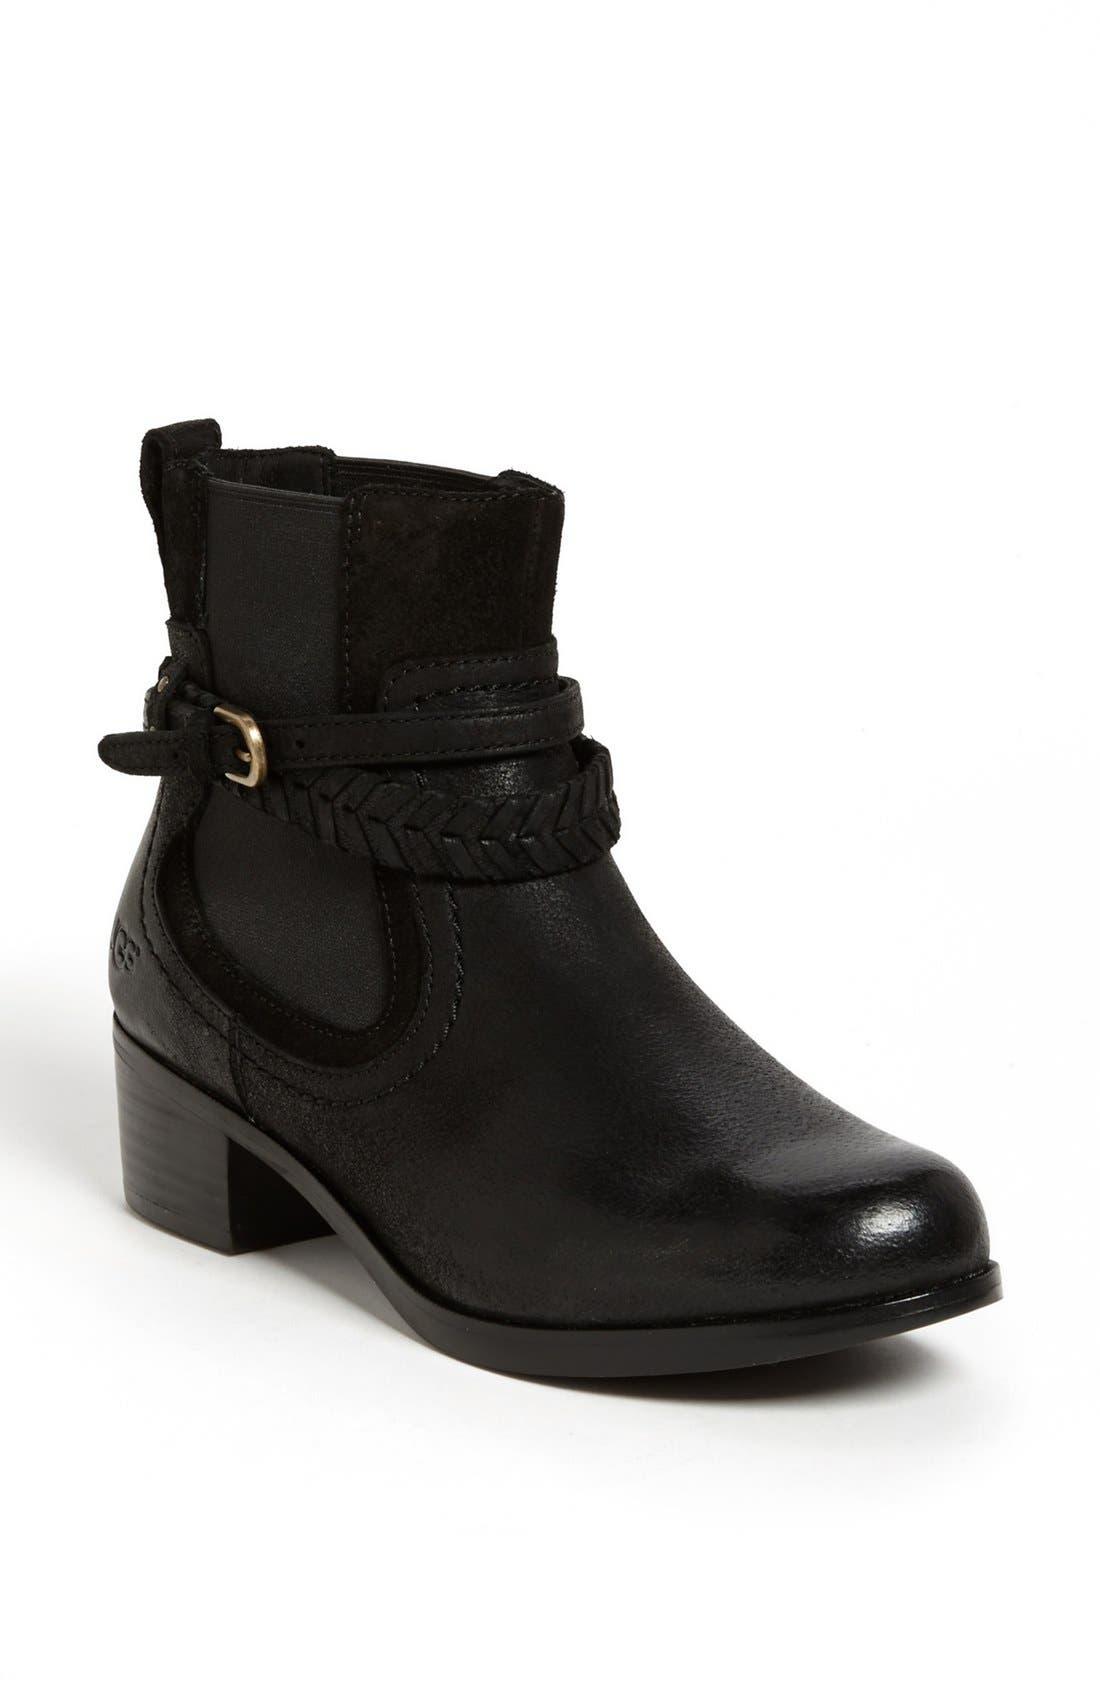 Australia 'Krewe' Boot,                             Main thumbnail 1, color,                             Black